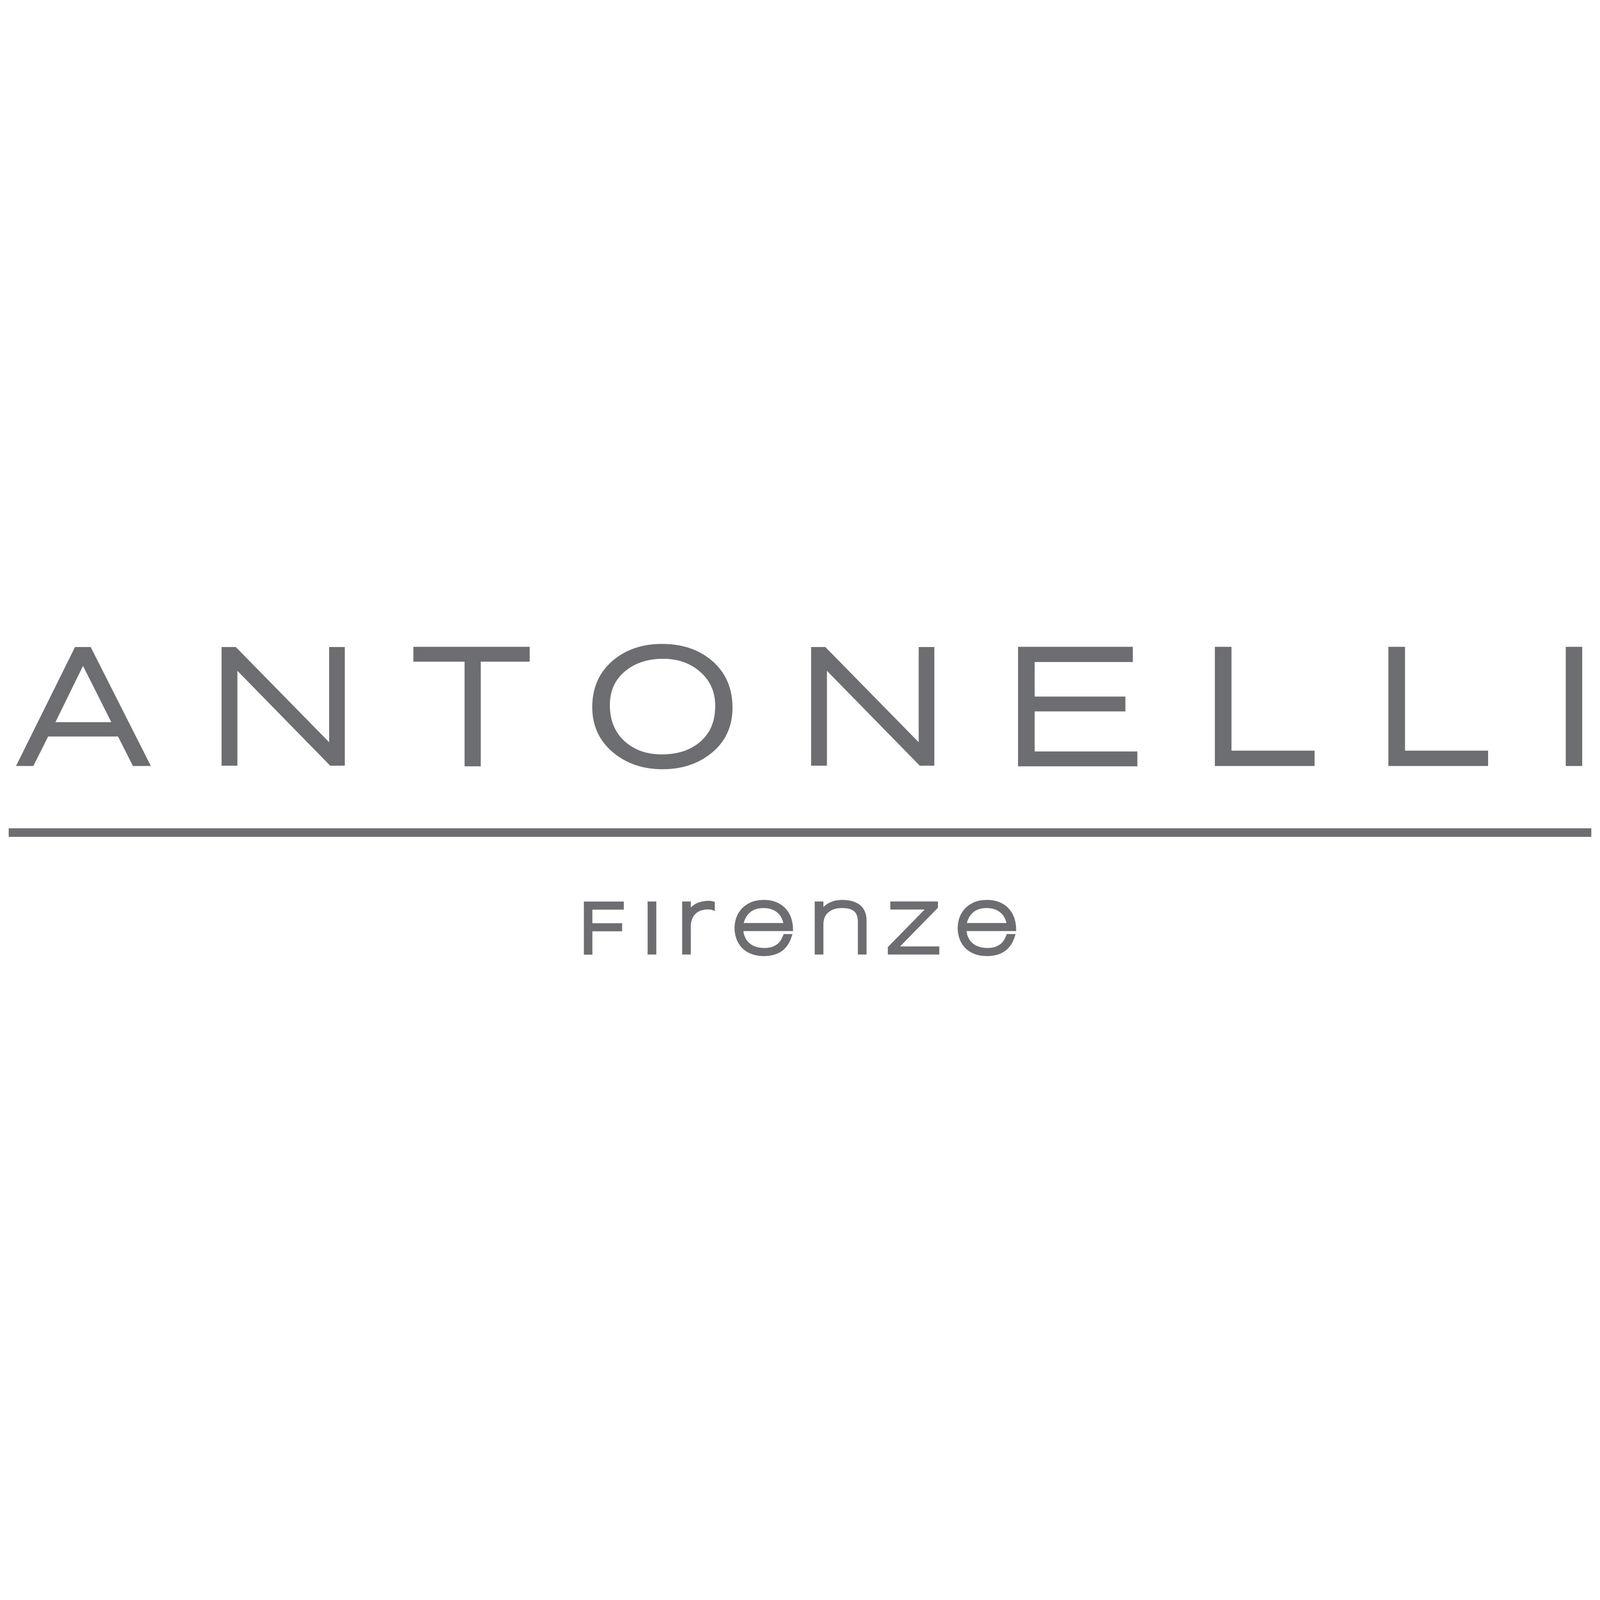 Antonelli Firenze (Image 1)